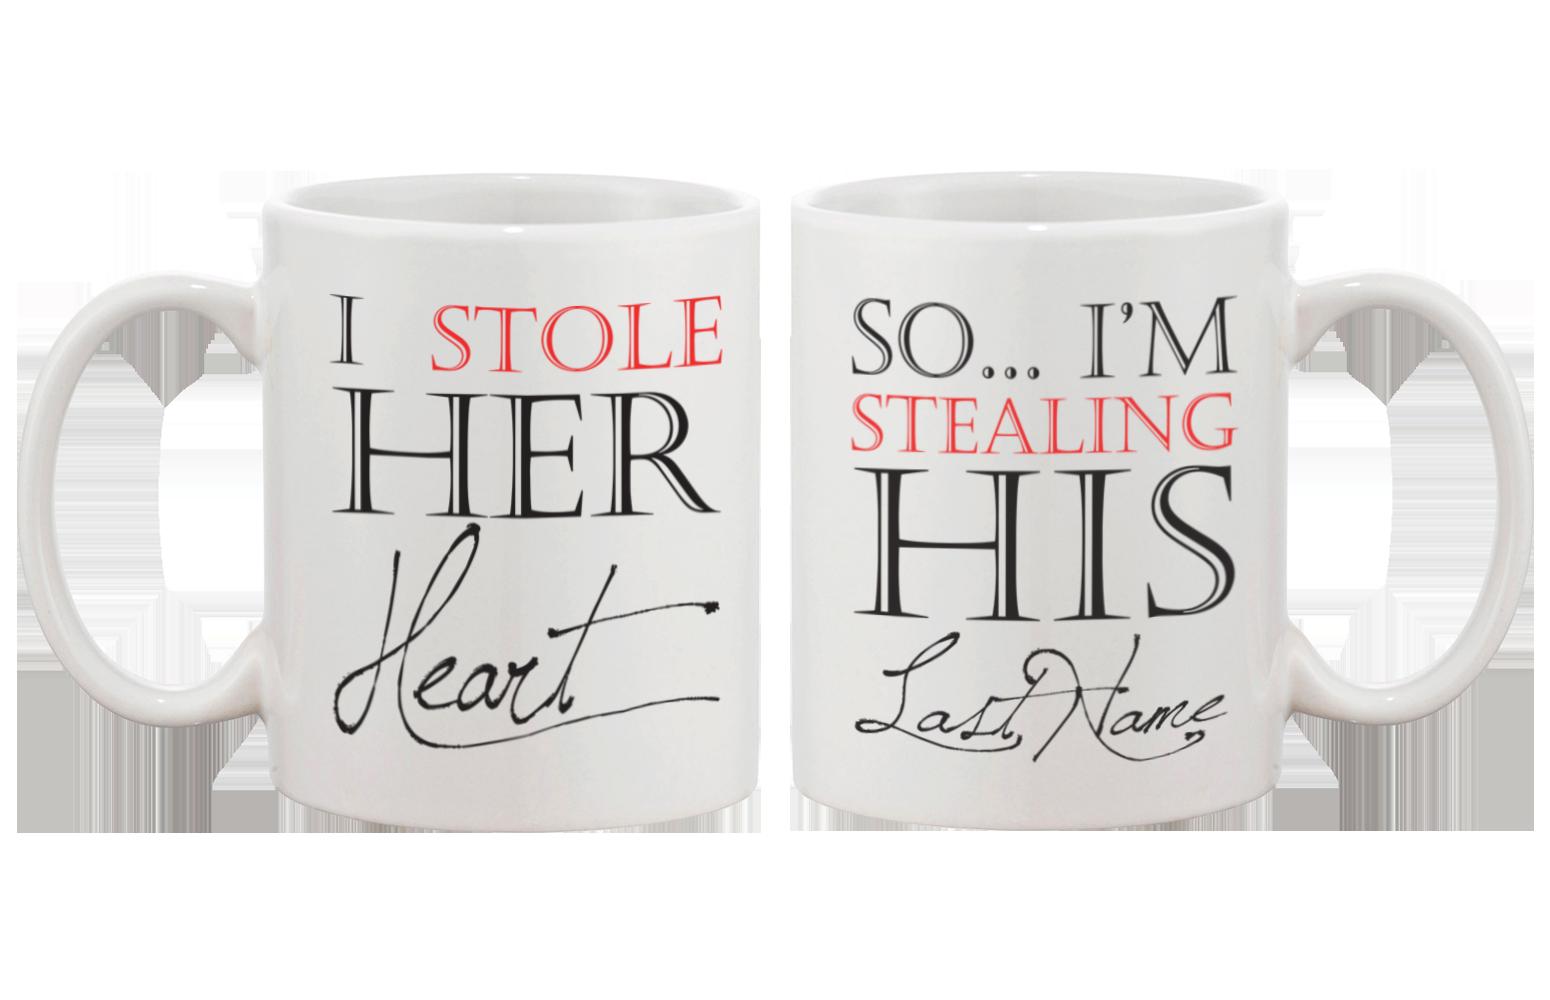 Unique couple mugs perfect. Cups clipart cup design